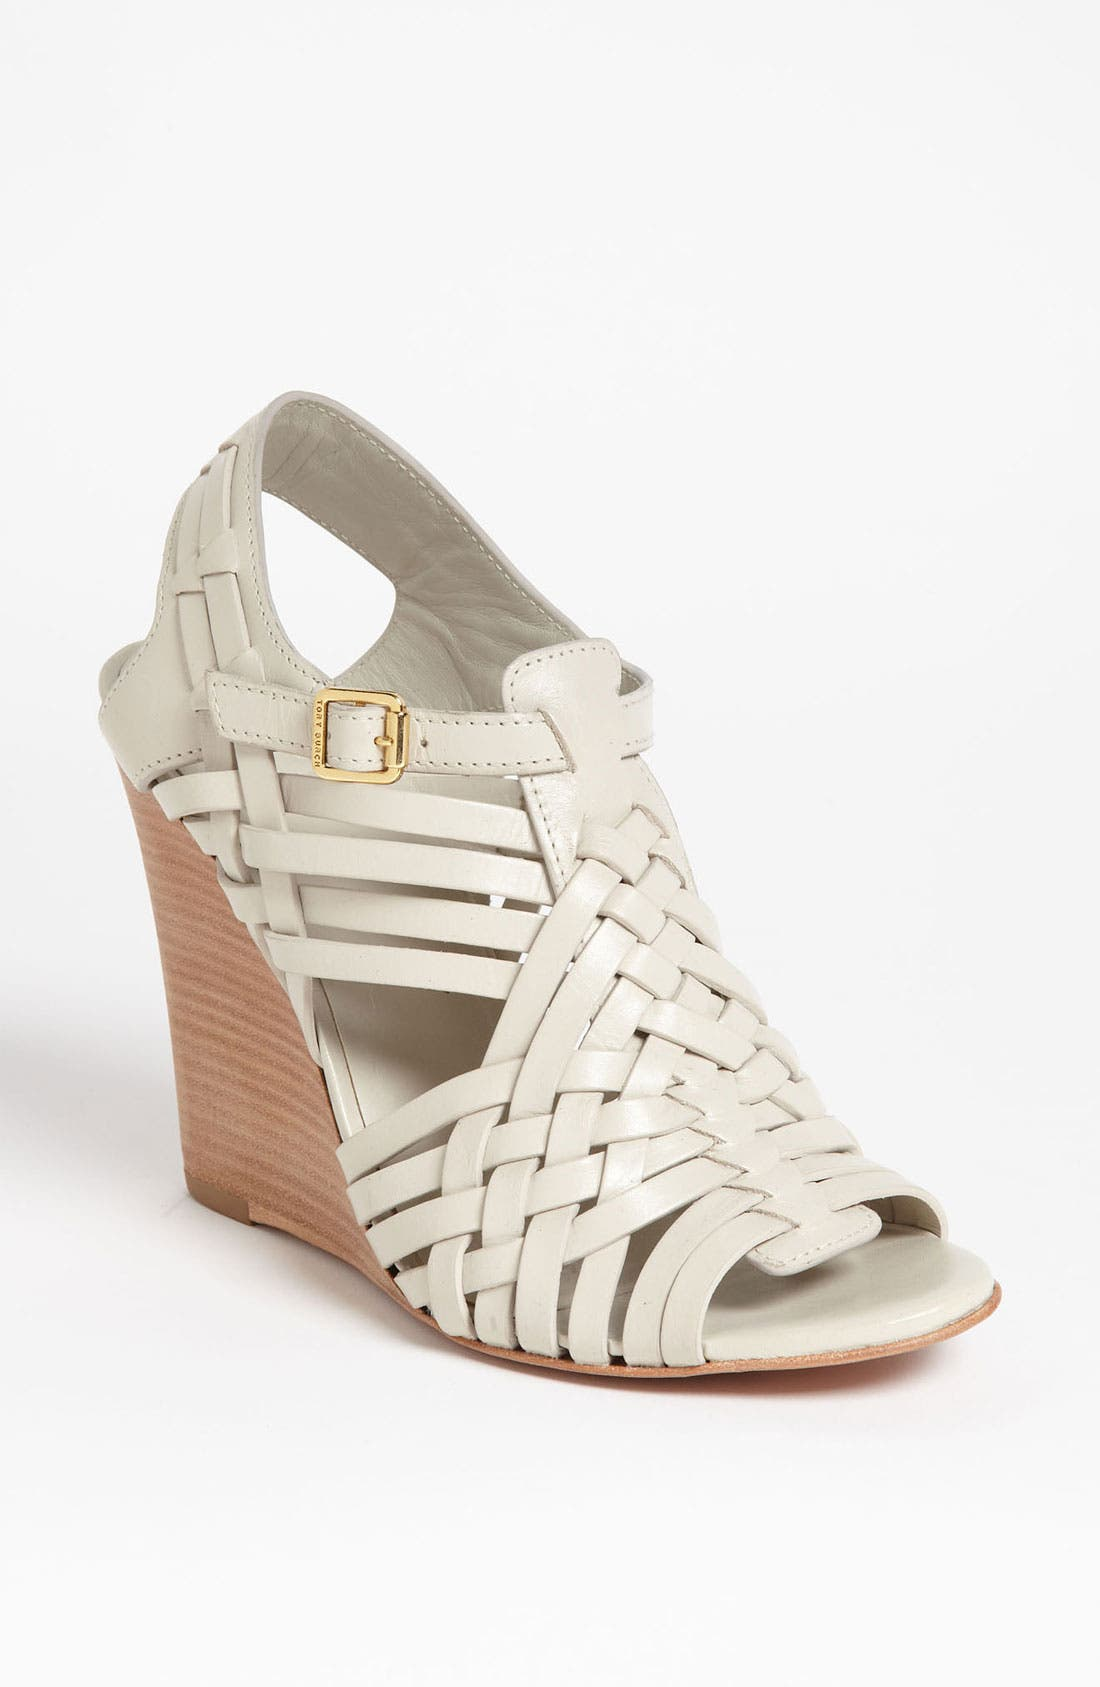 Main Image - Tory Burch 'Nadia' Wedge Sandal